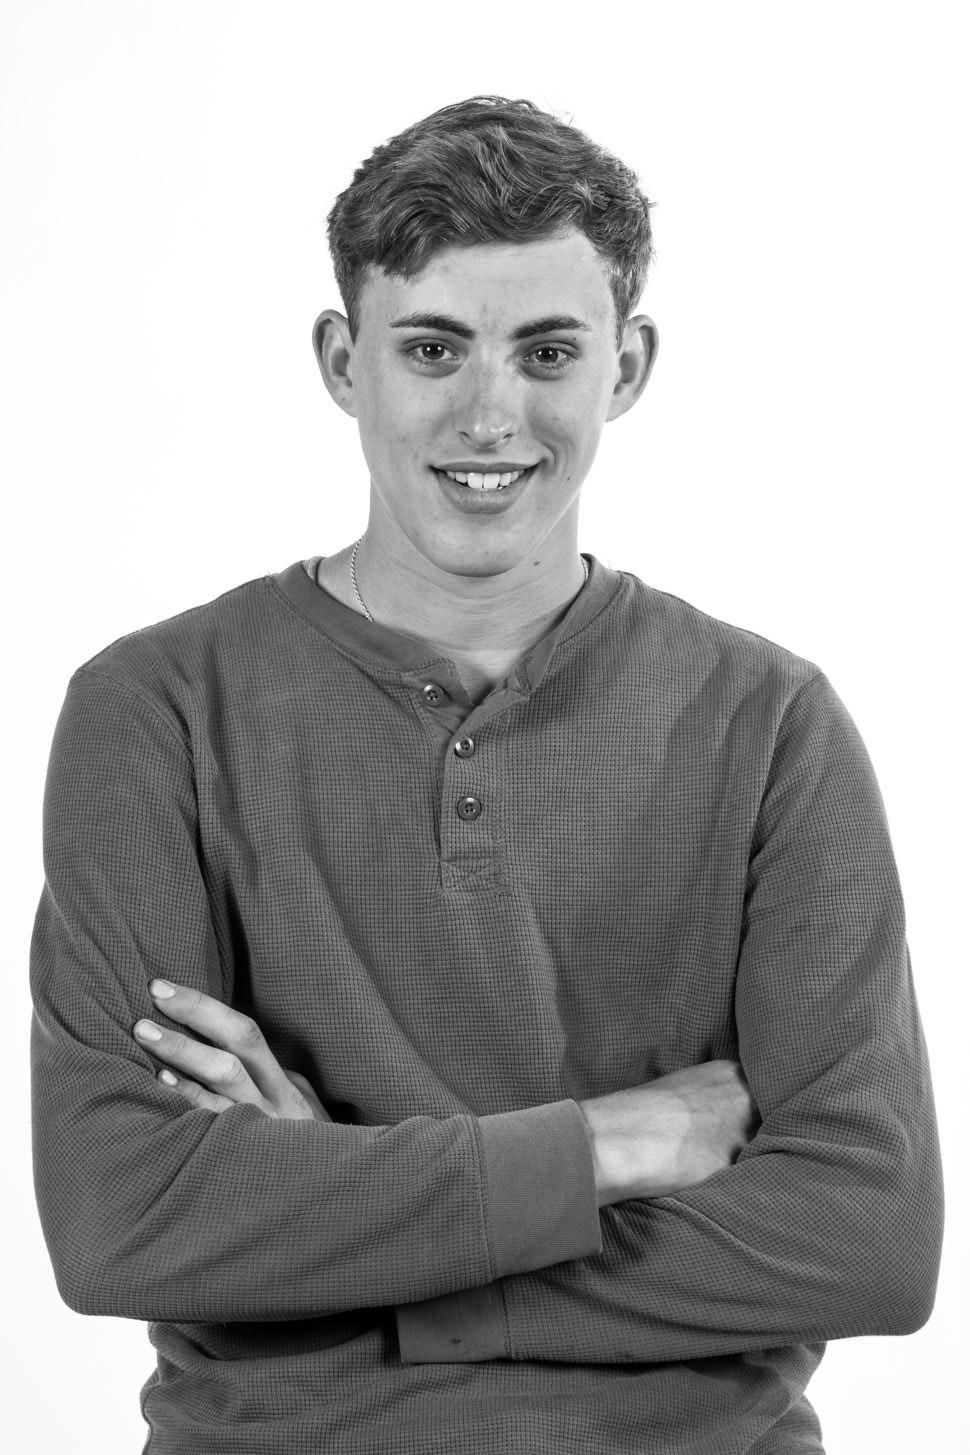 Male Model Session